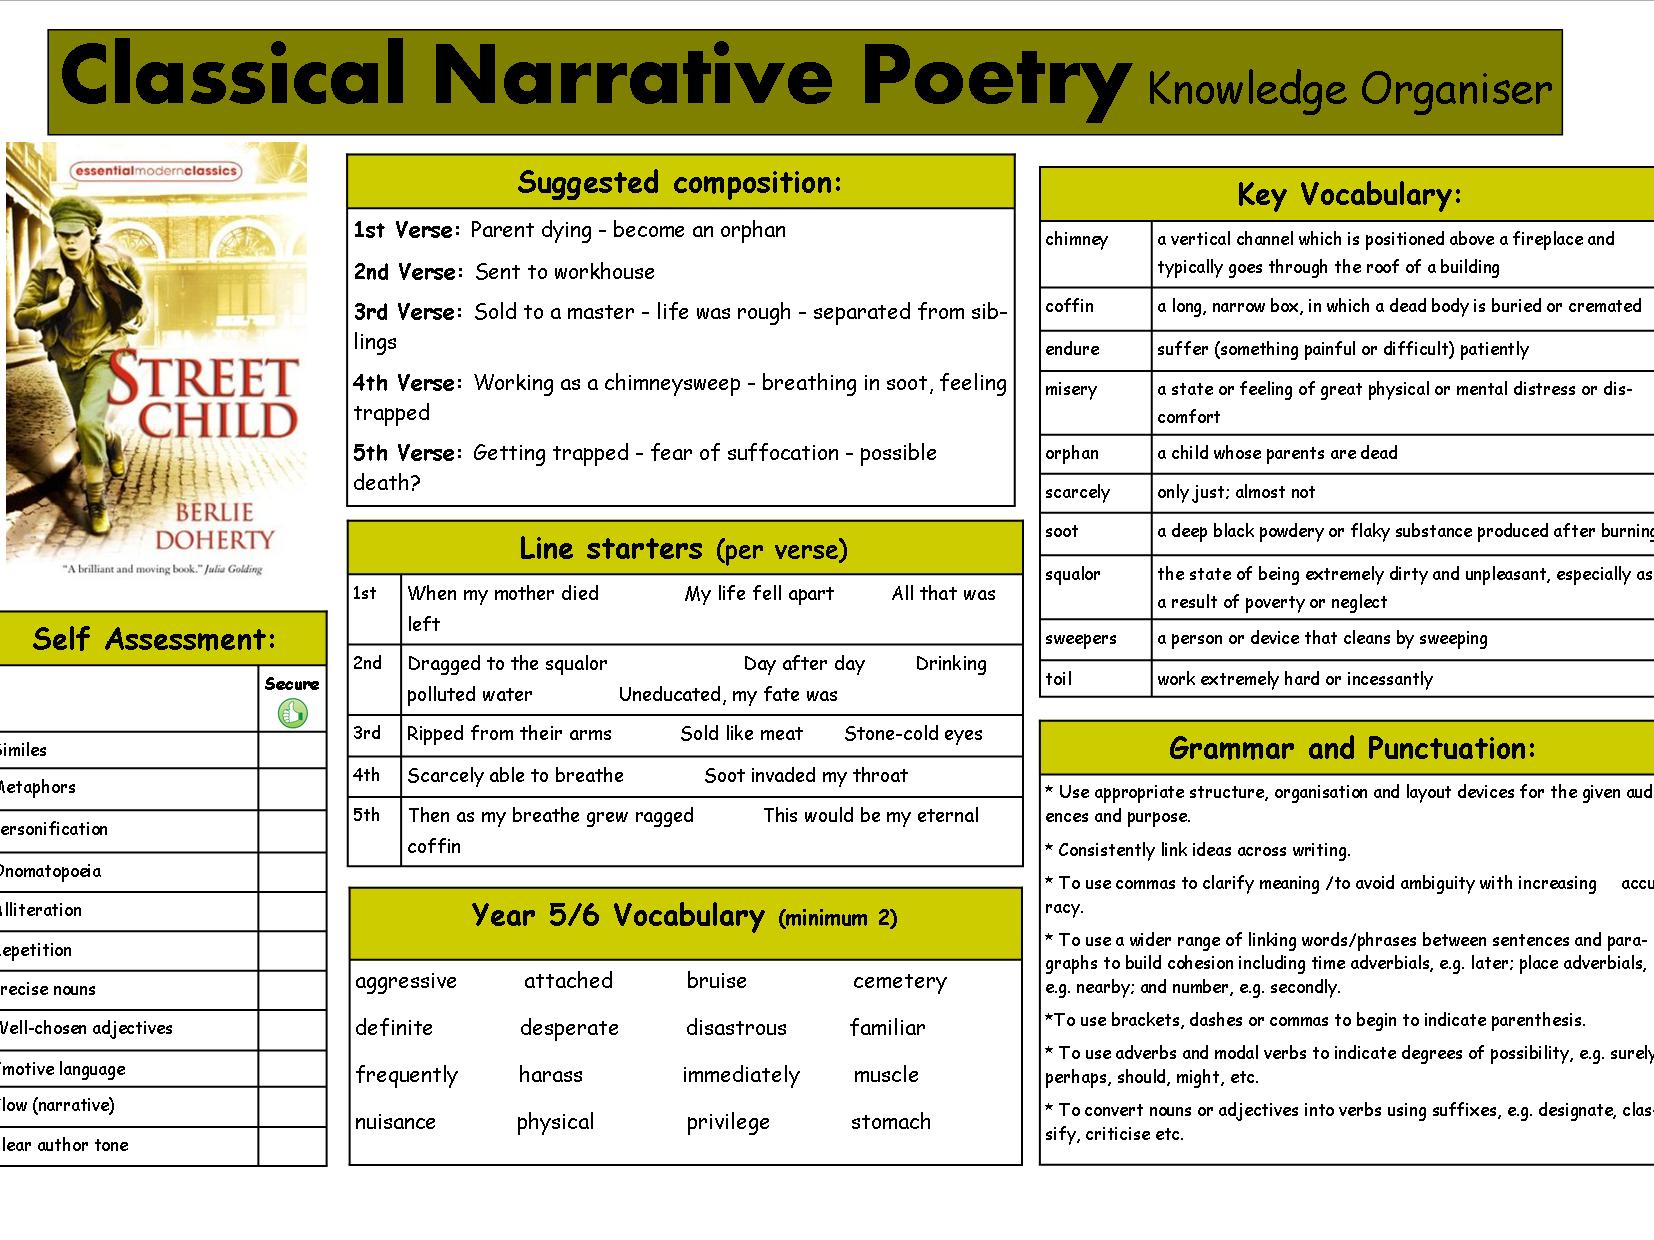 Classical Narrative Poem Knowledge Organiser